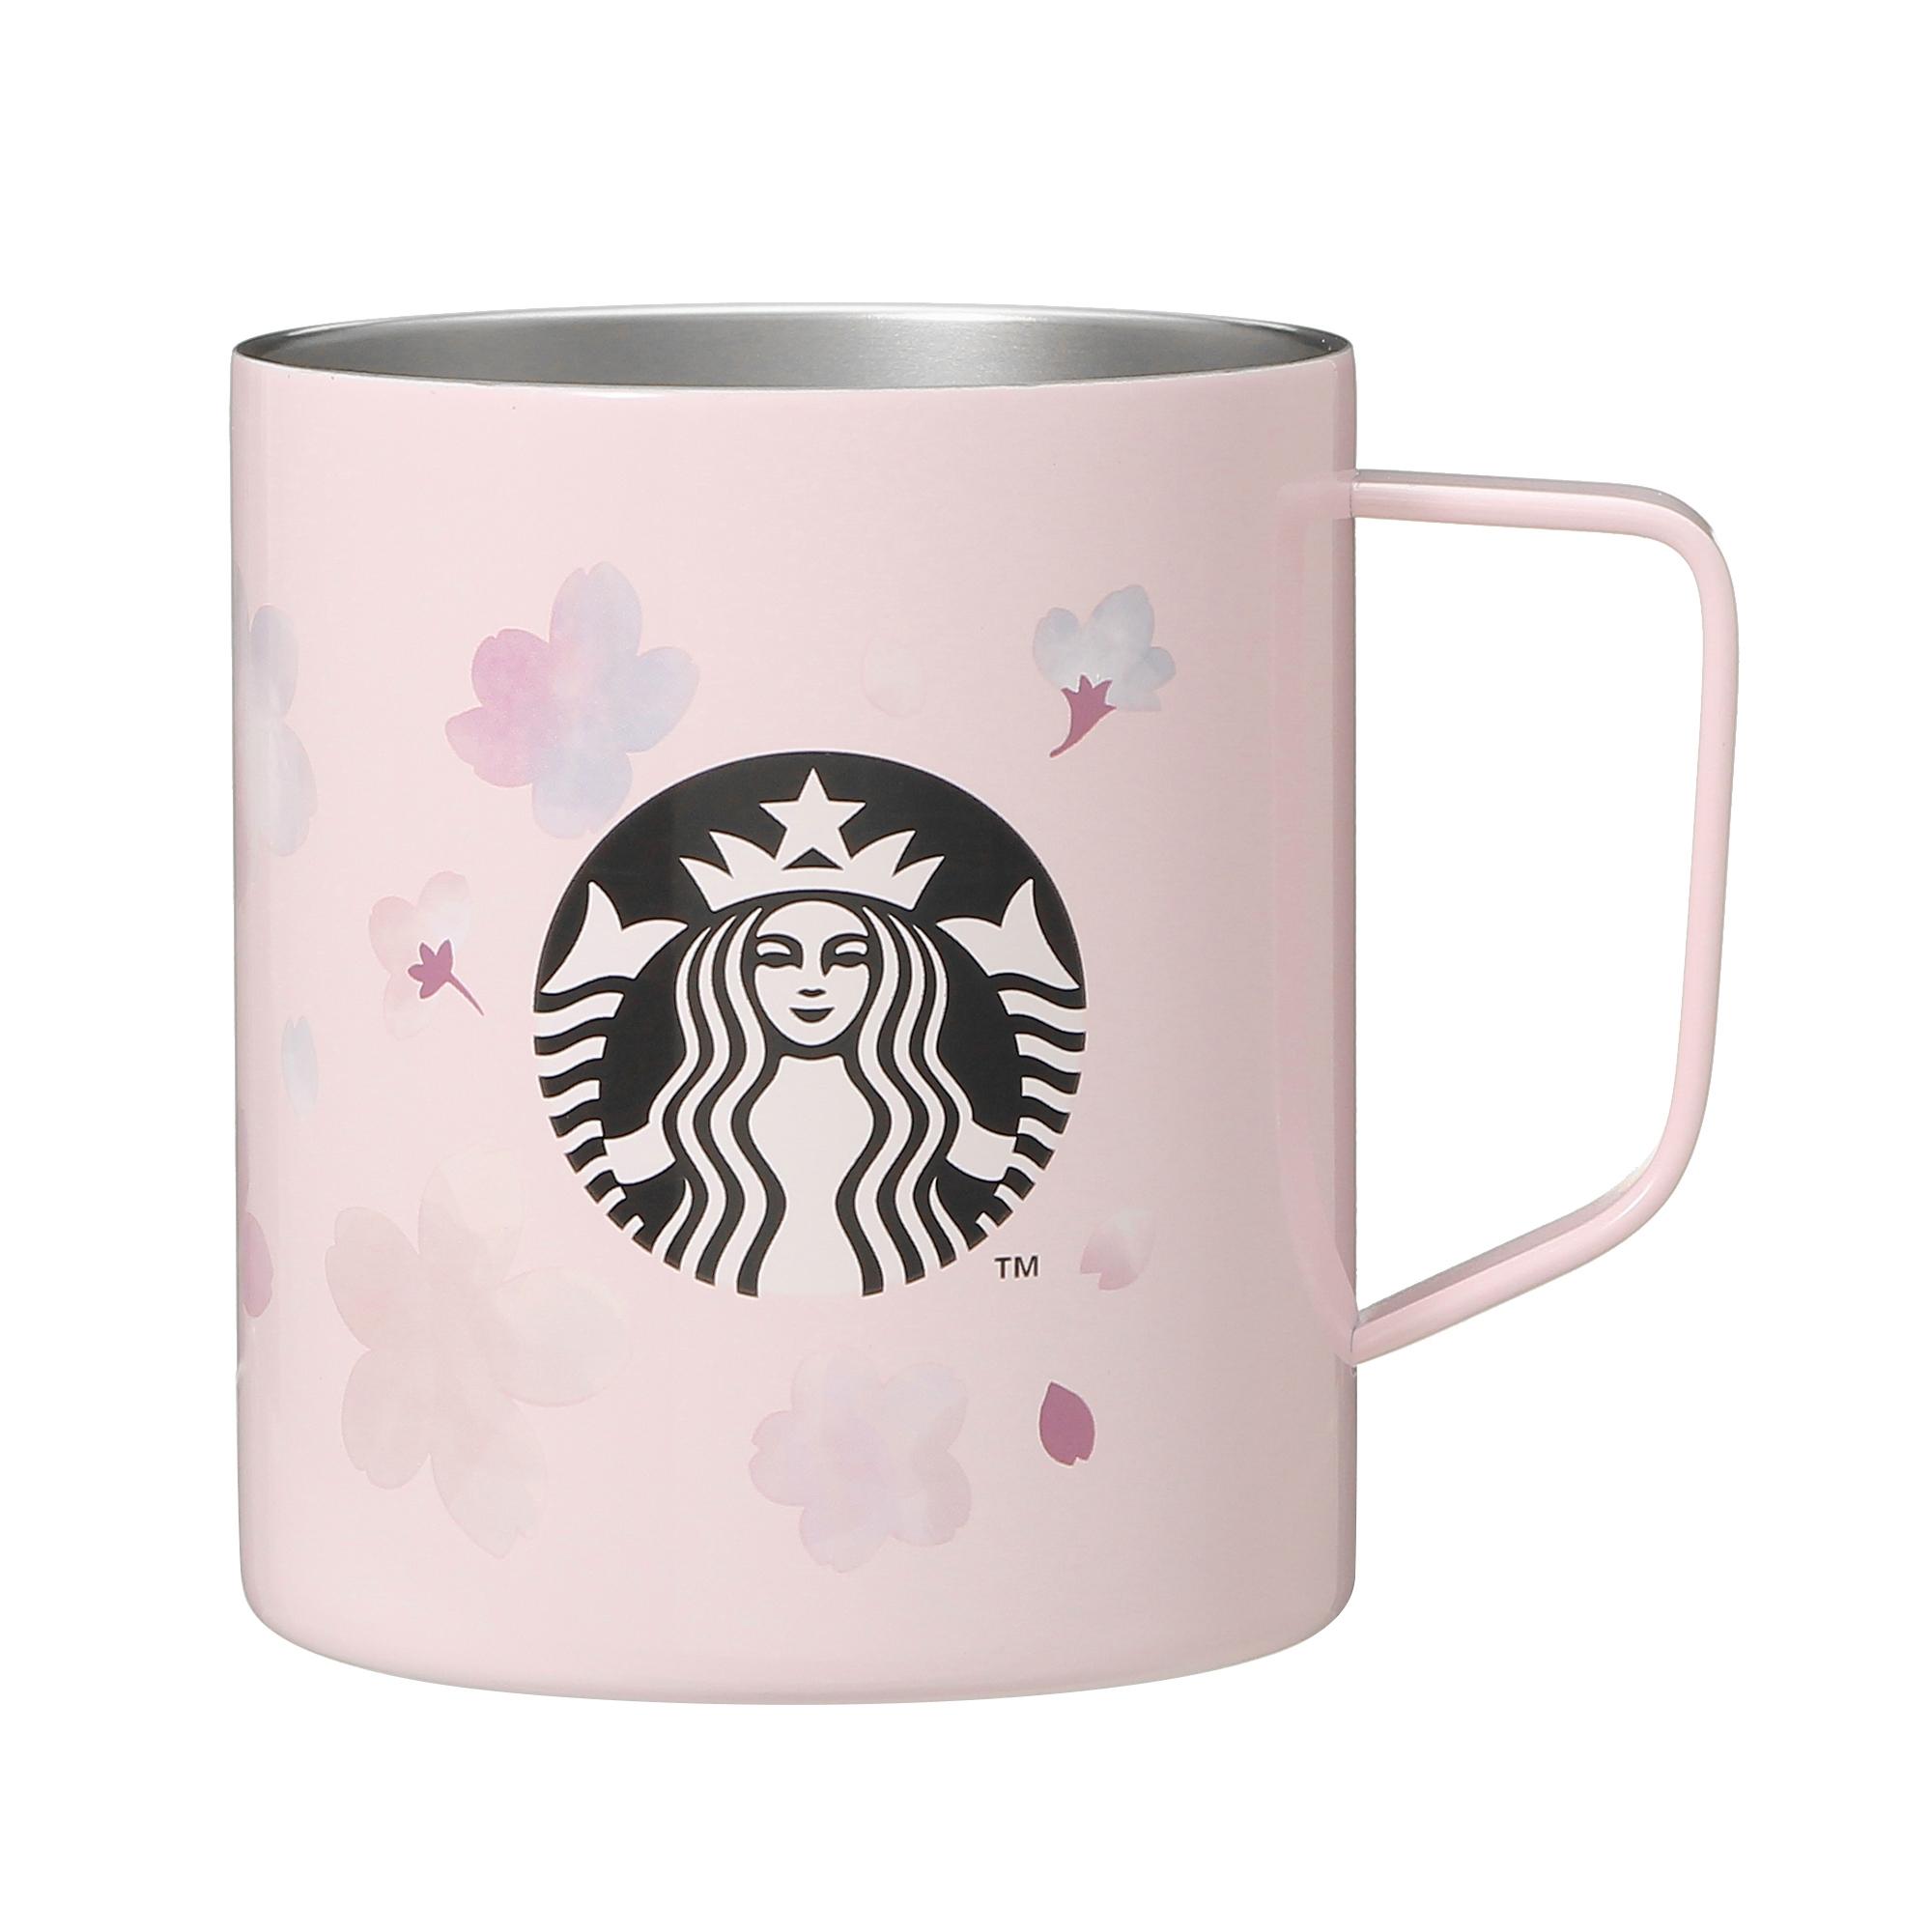 Starbucks Japan Sakura 2021 Stainless Steel Pink Breath Mug